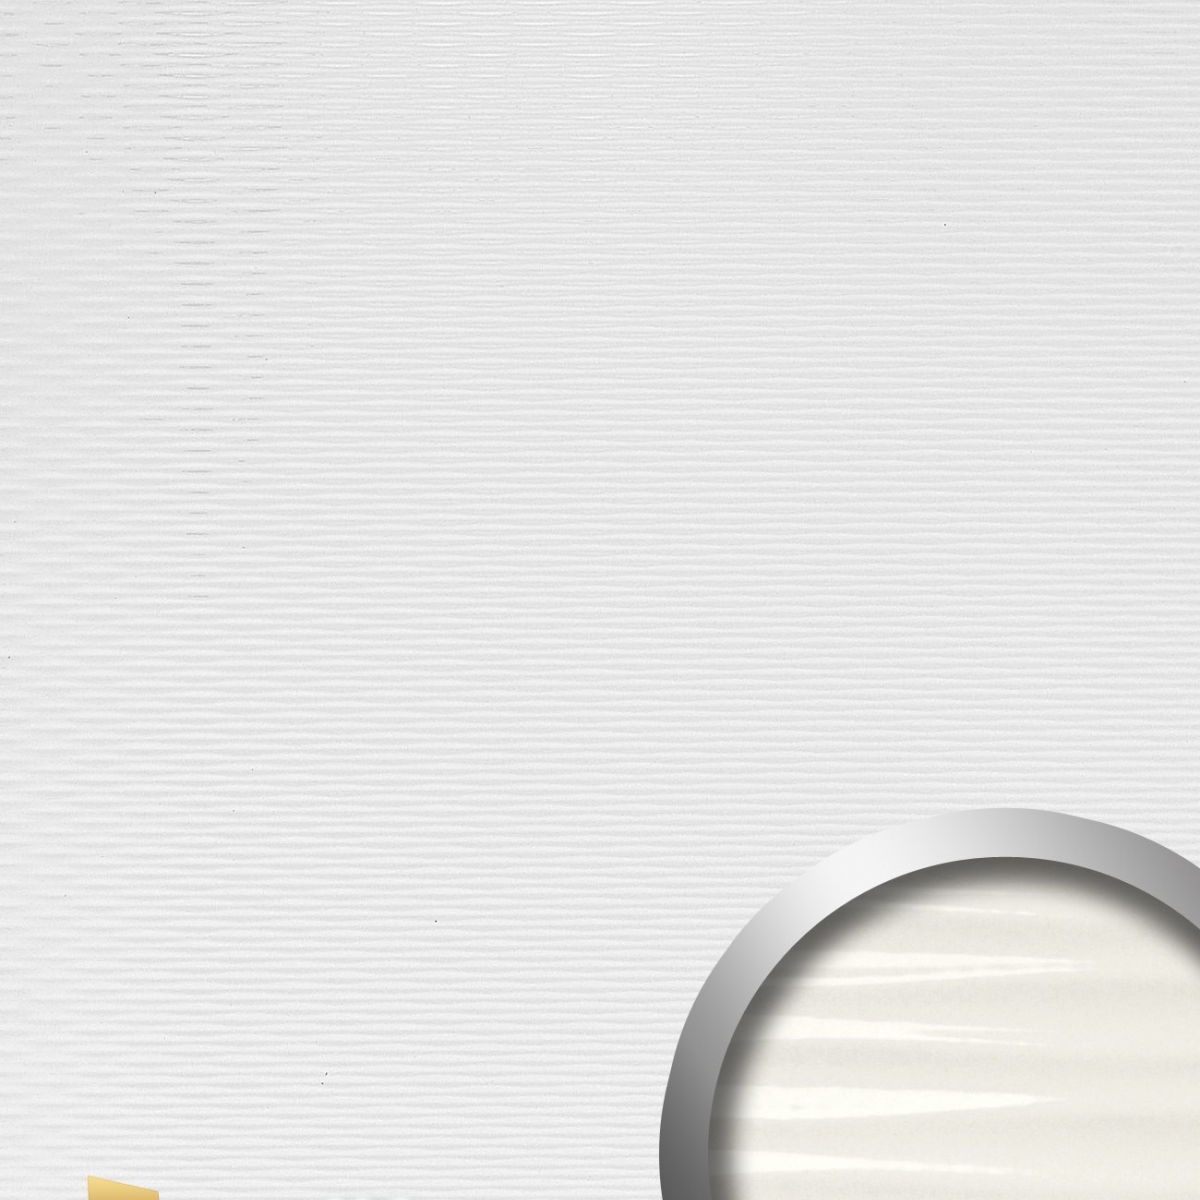 Panou decorativ ACRYLIC 15764, WallFace, autocolant